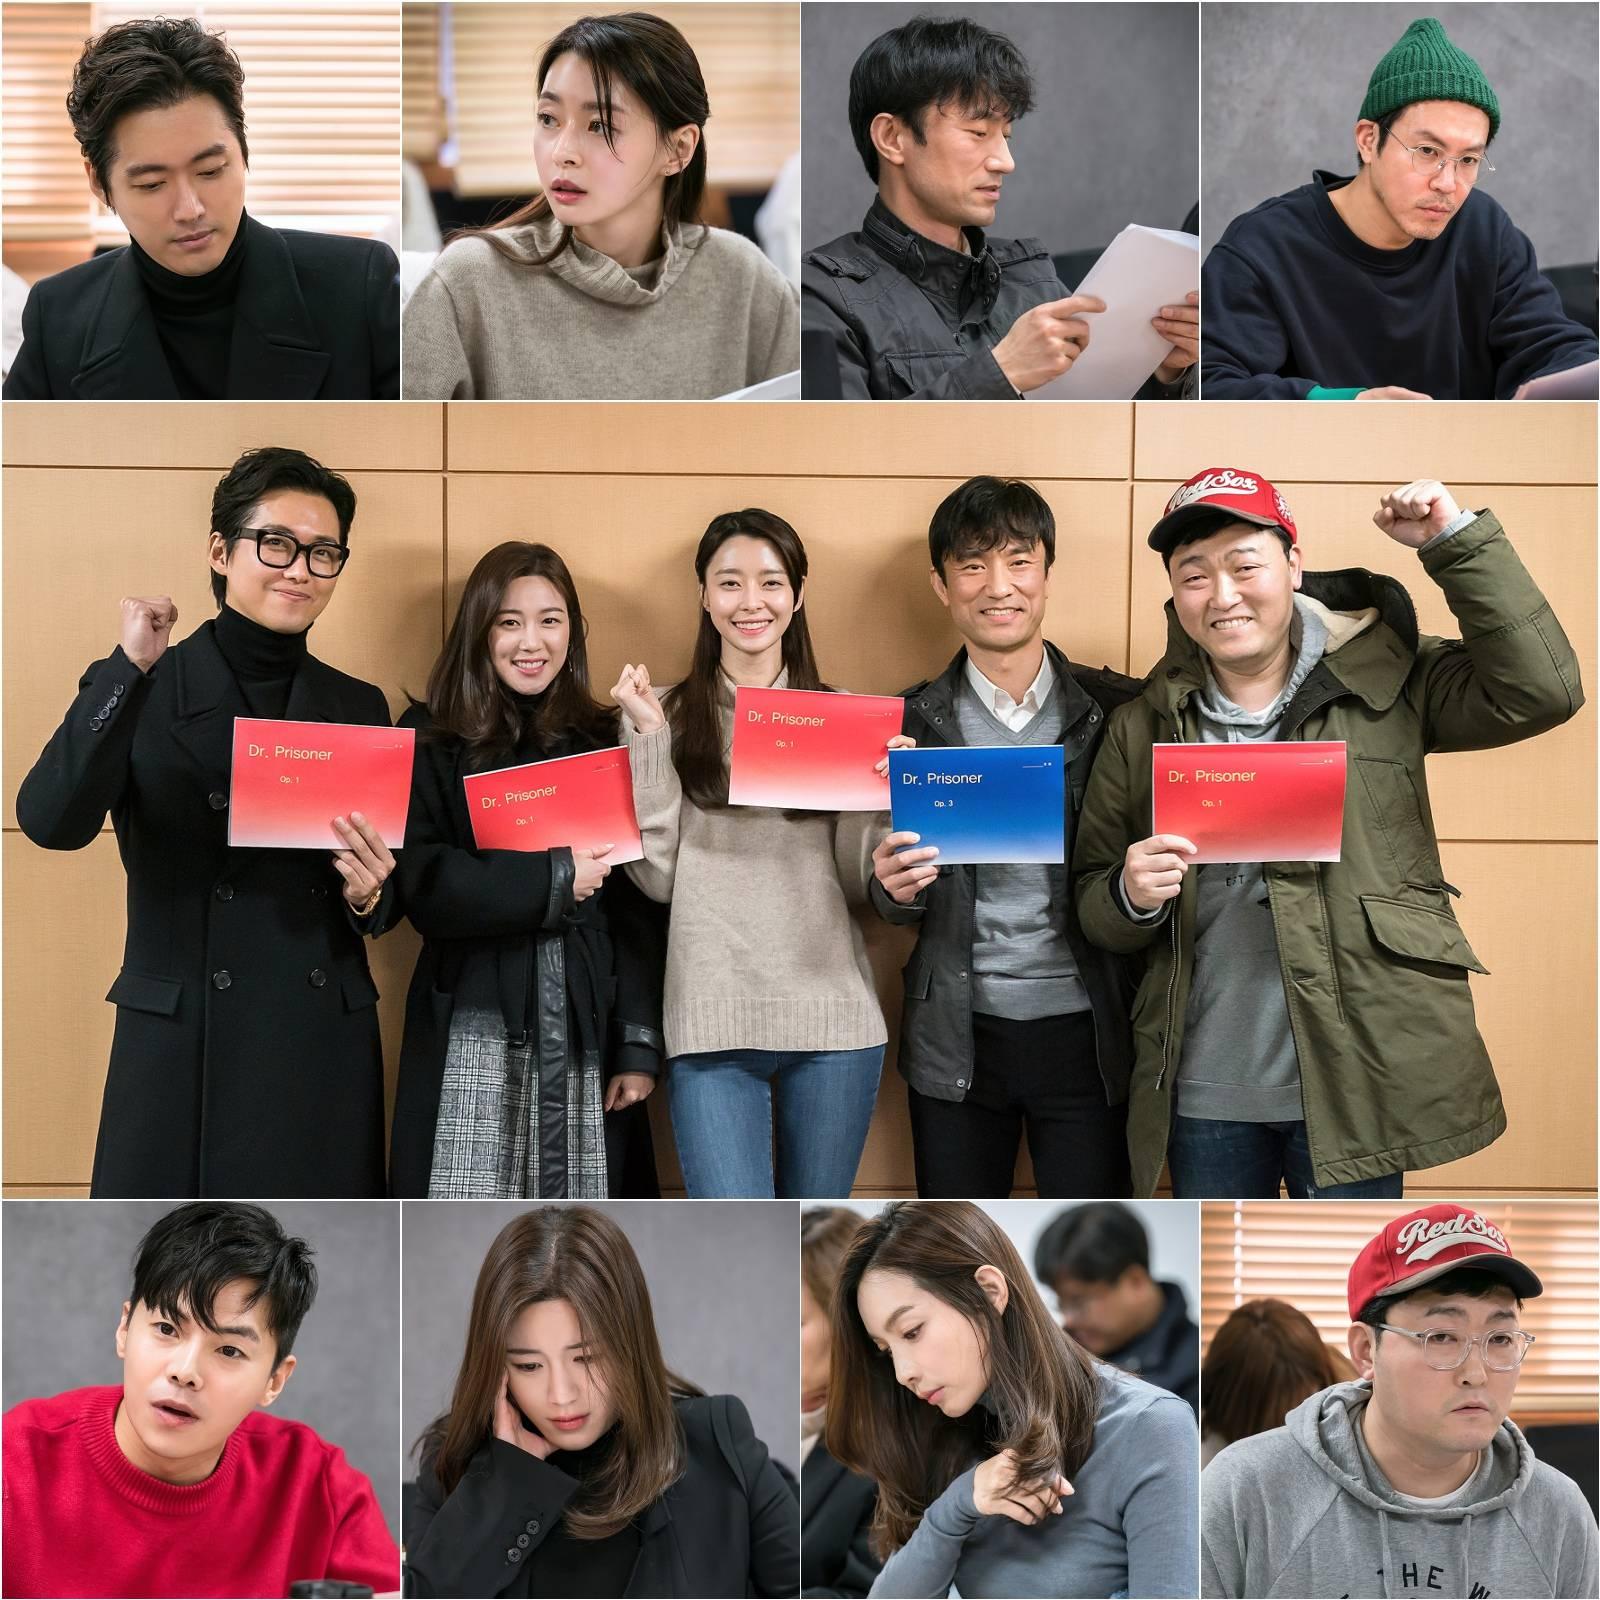 Doctor Prisoner (Korean Drama - 2019) - 닥터 프리즈너